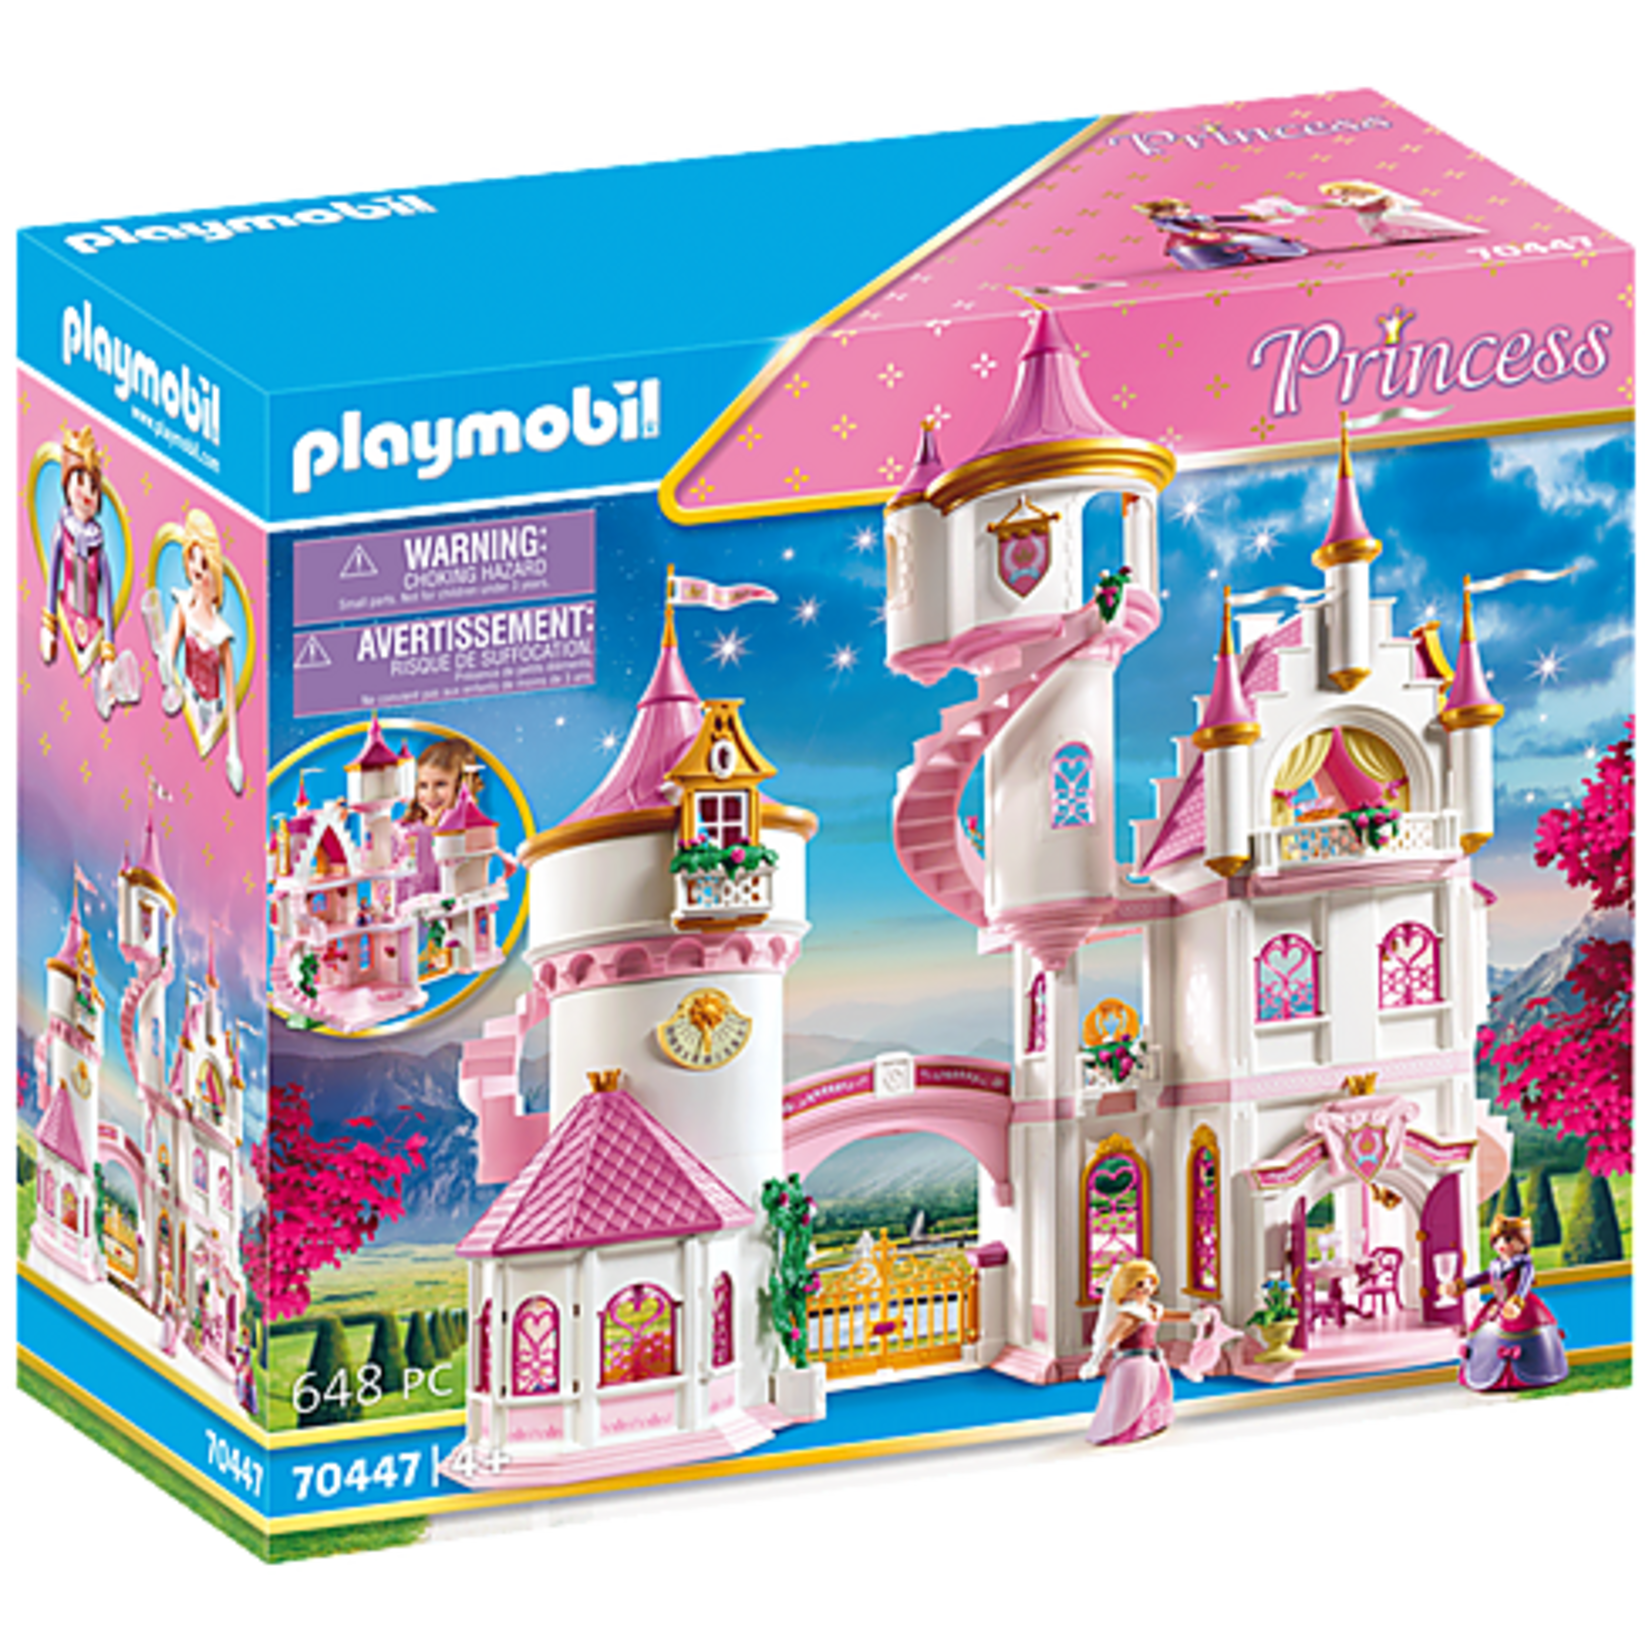 Playmobil Large Princess Castle - Playmobil 70447